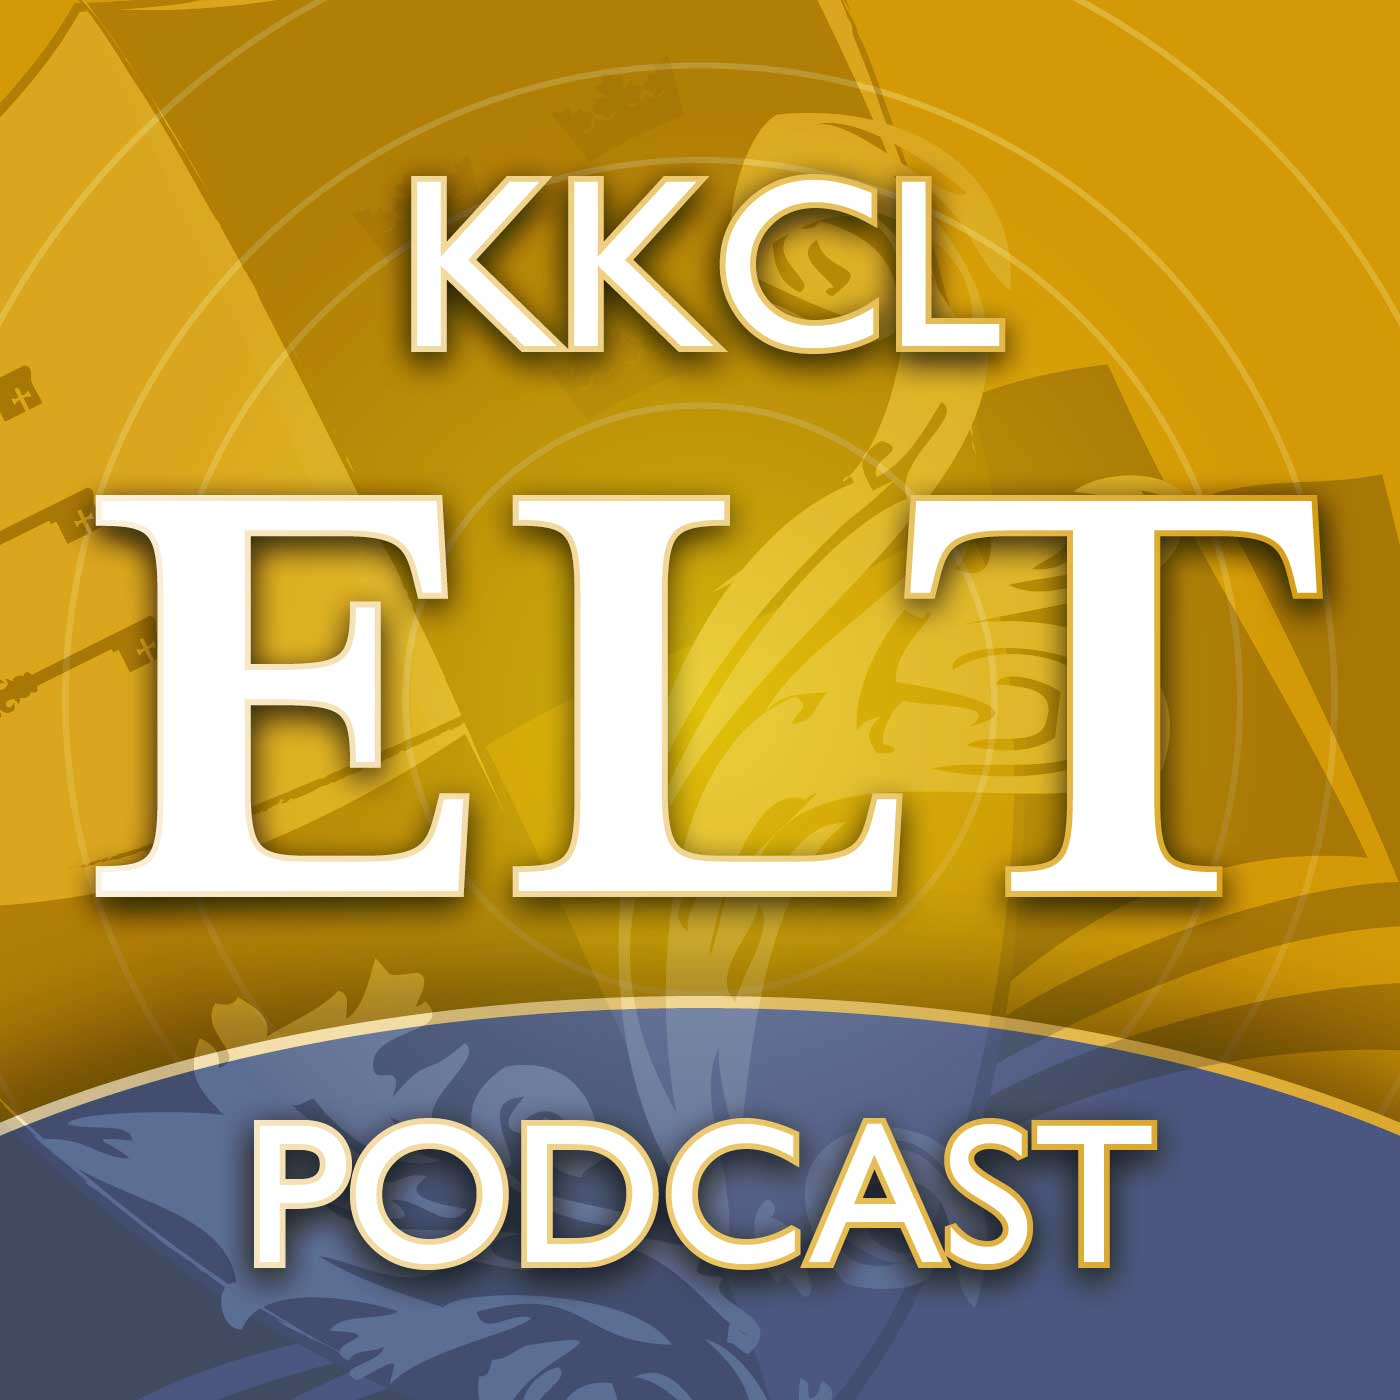 KKCL ELT Podcast